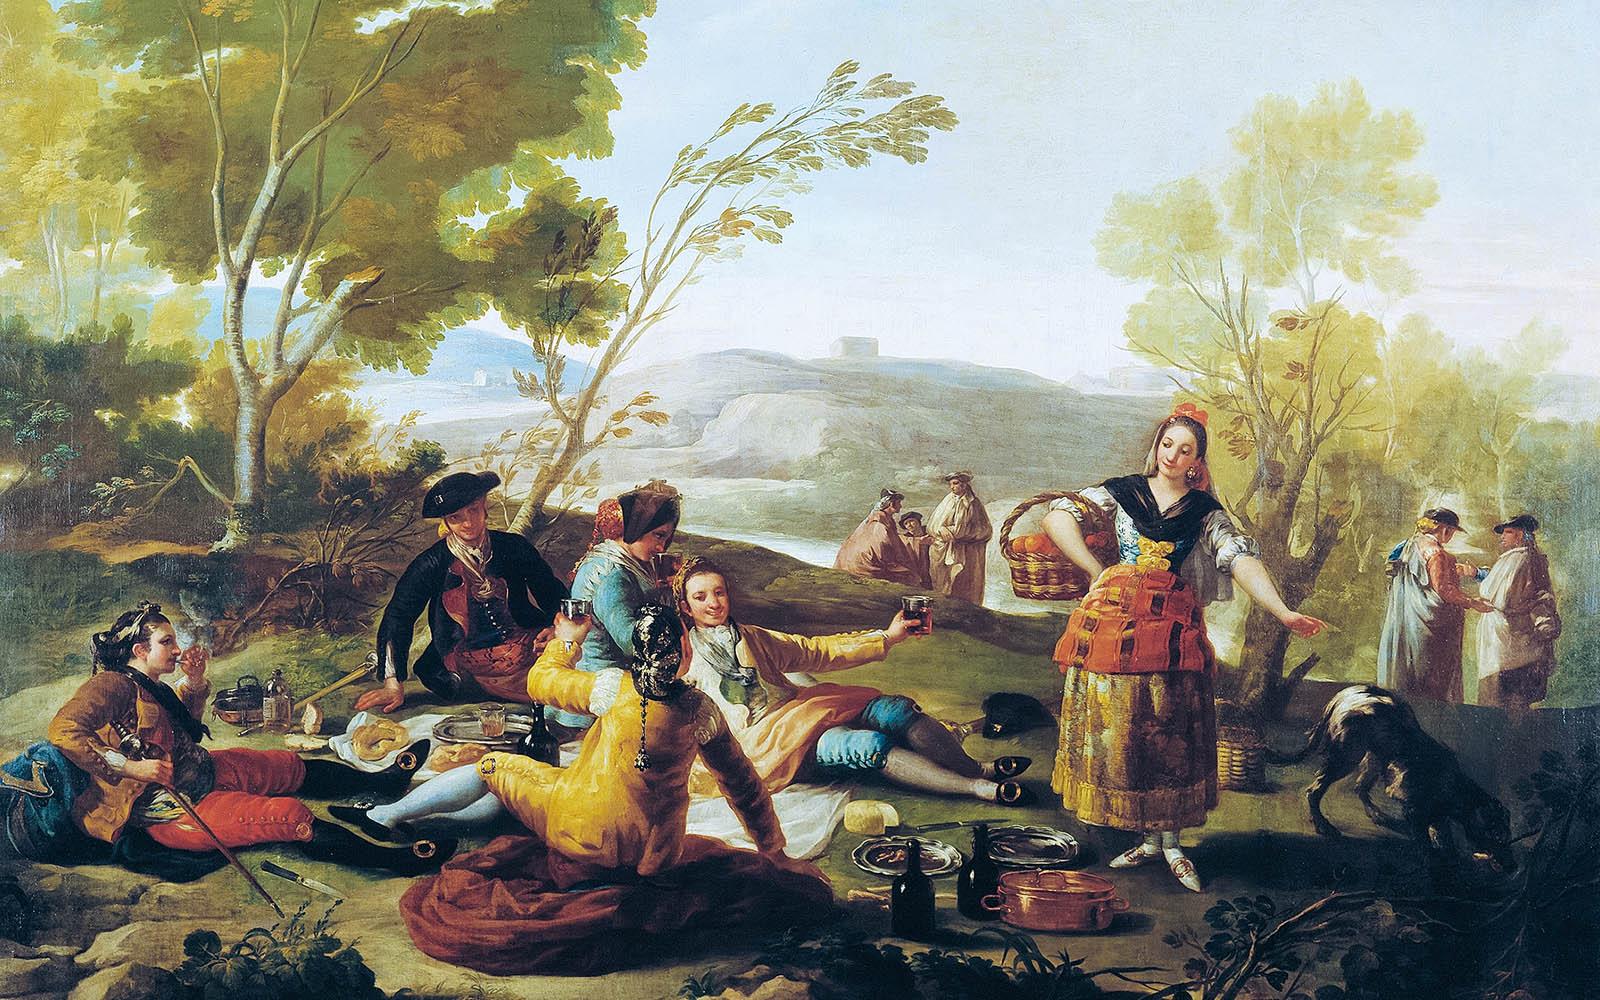 Пикник — группа эдмунда шклярского